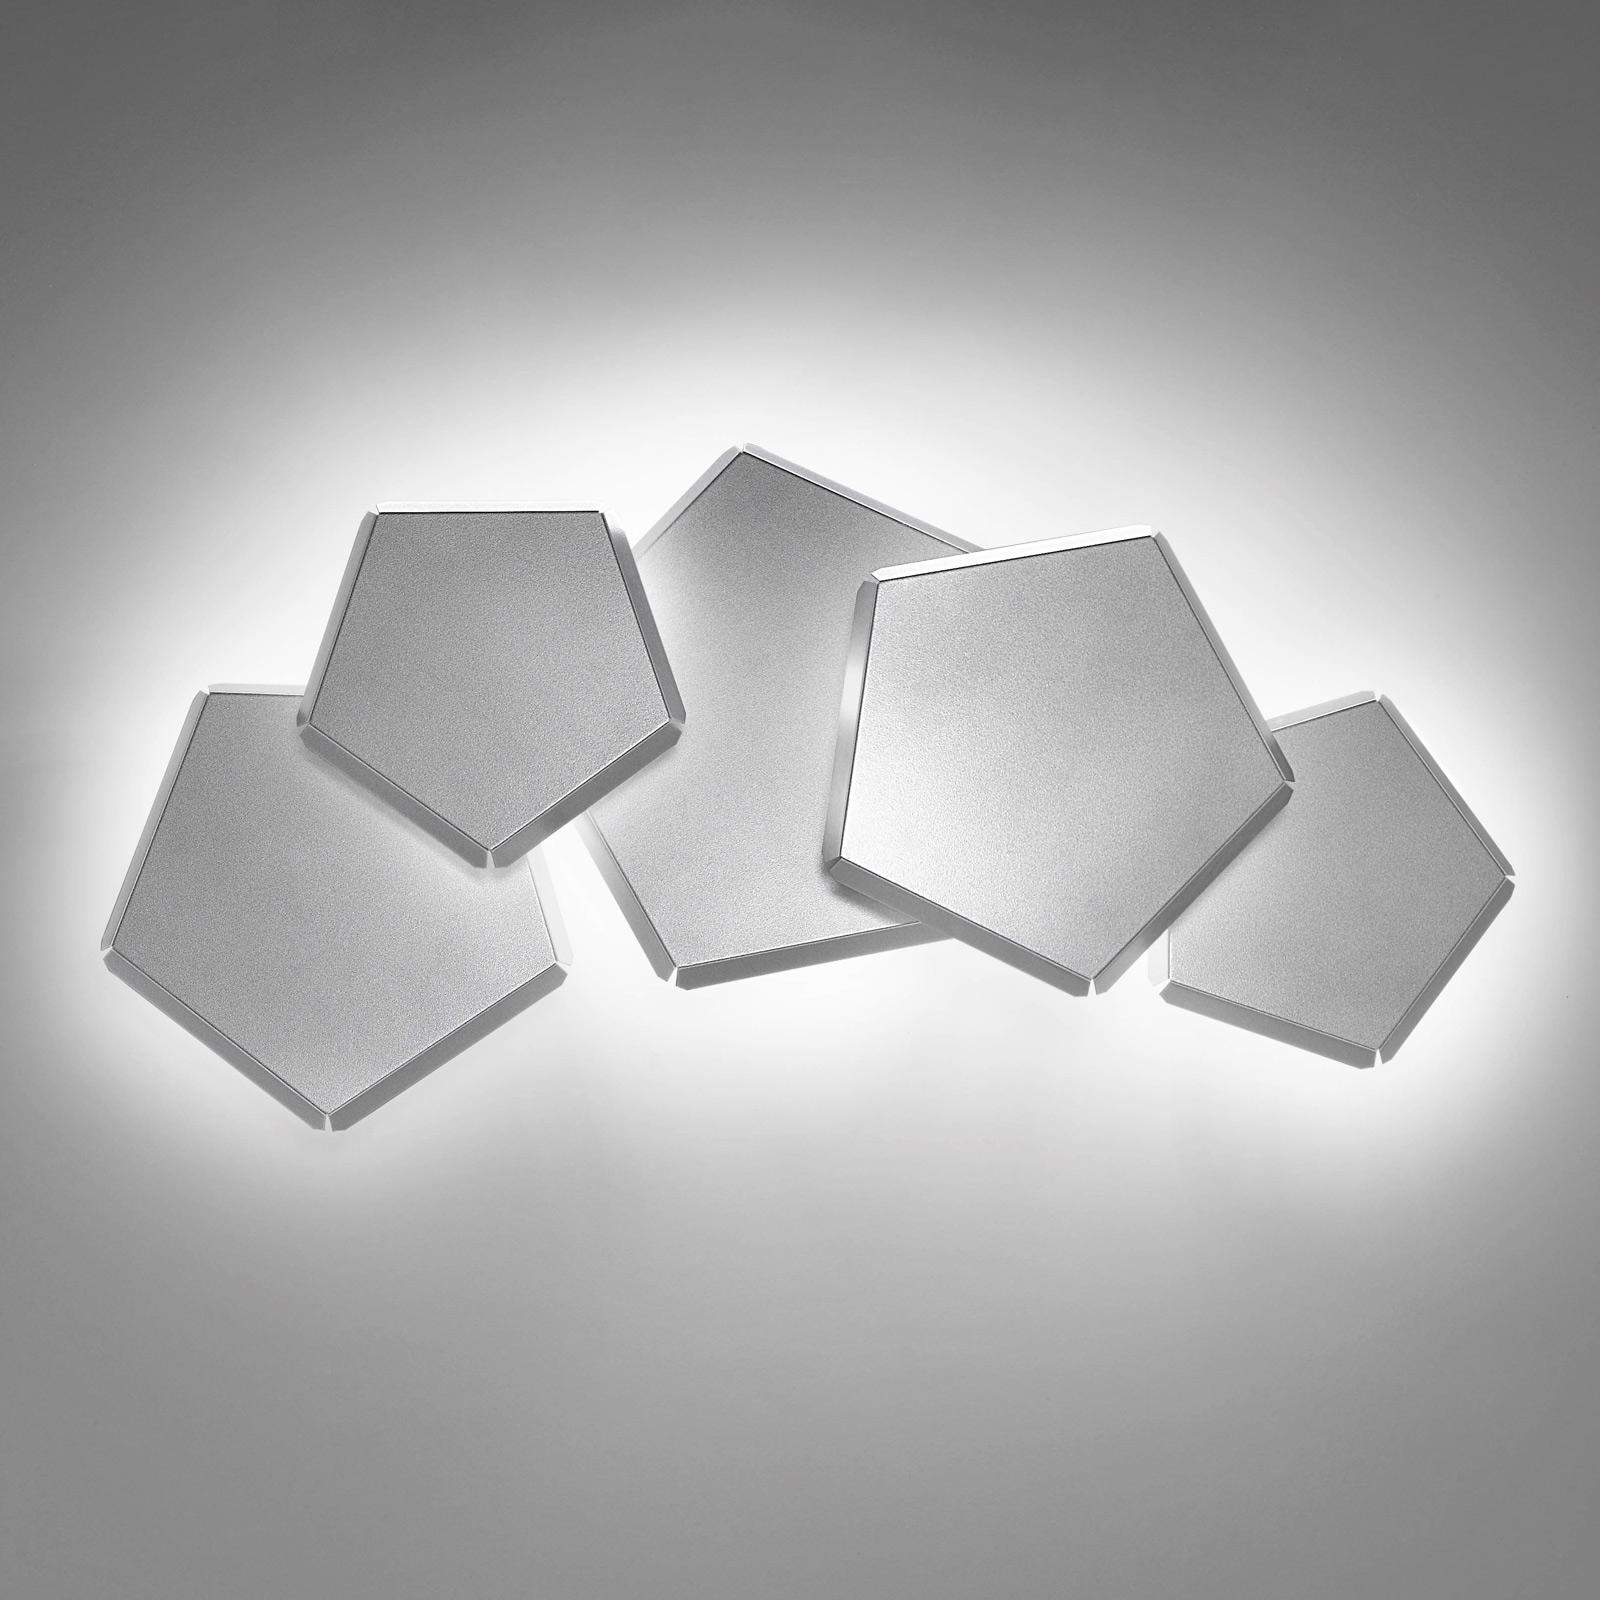 LED-vegglampe Pleiadi i sølv, 5 lyskilder